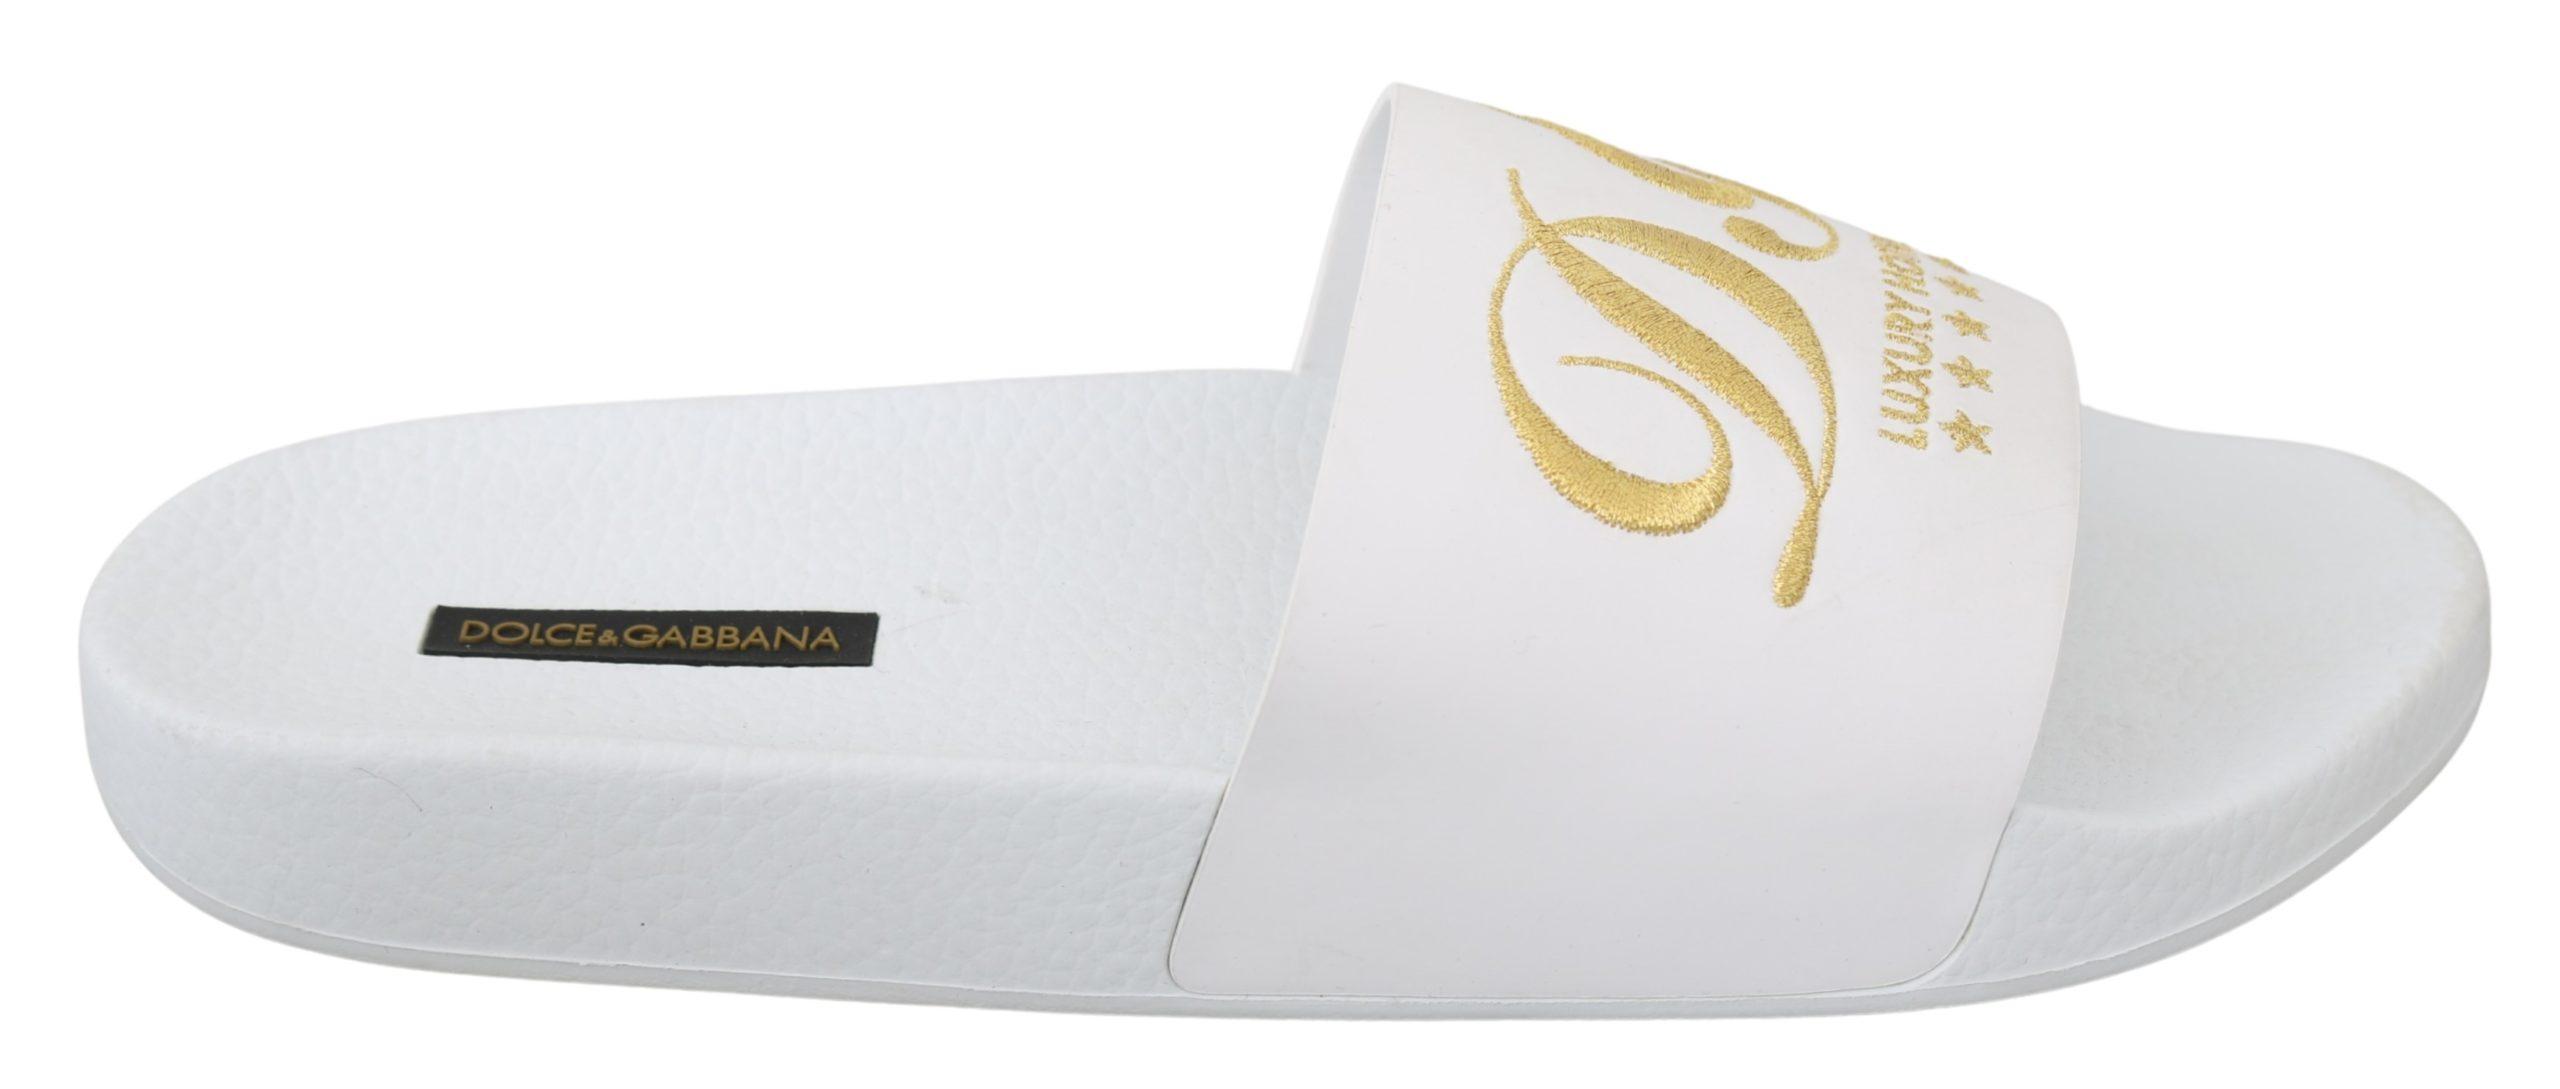 Dolce & Gabbana Women's Leather Luxury Hotel Slipper White LA7109 - EU41/US10.5